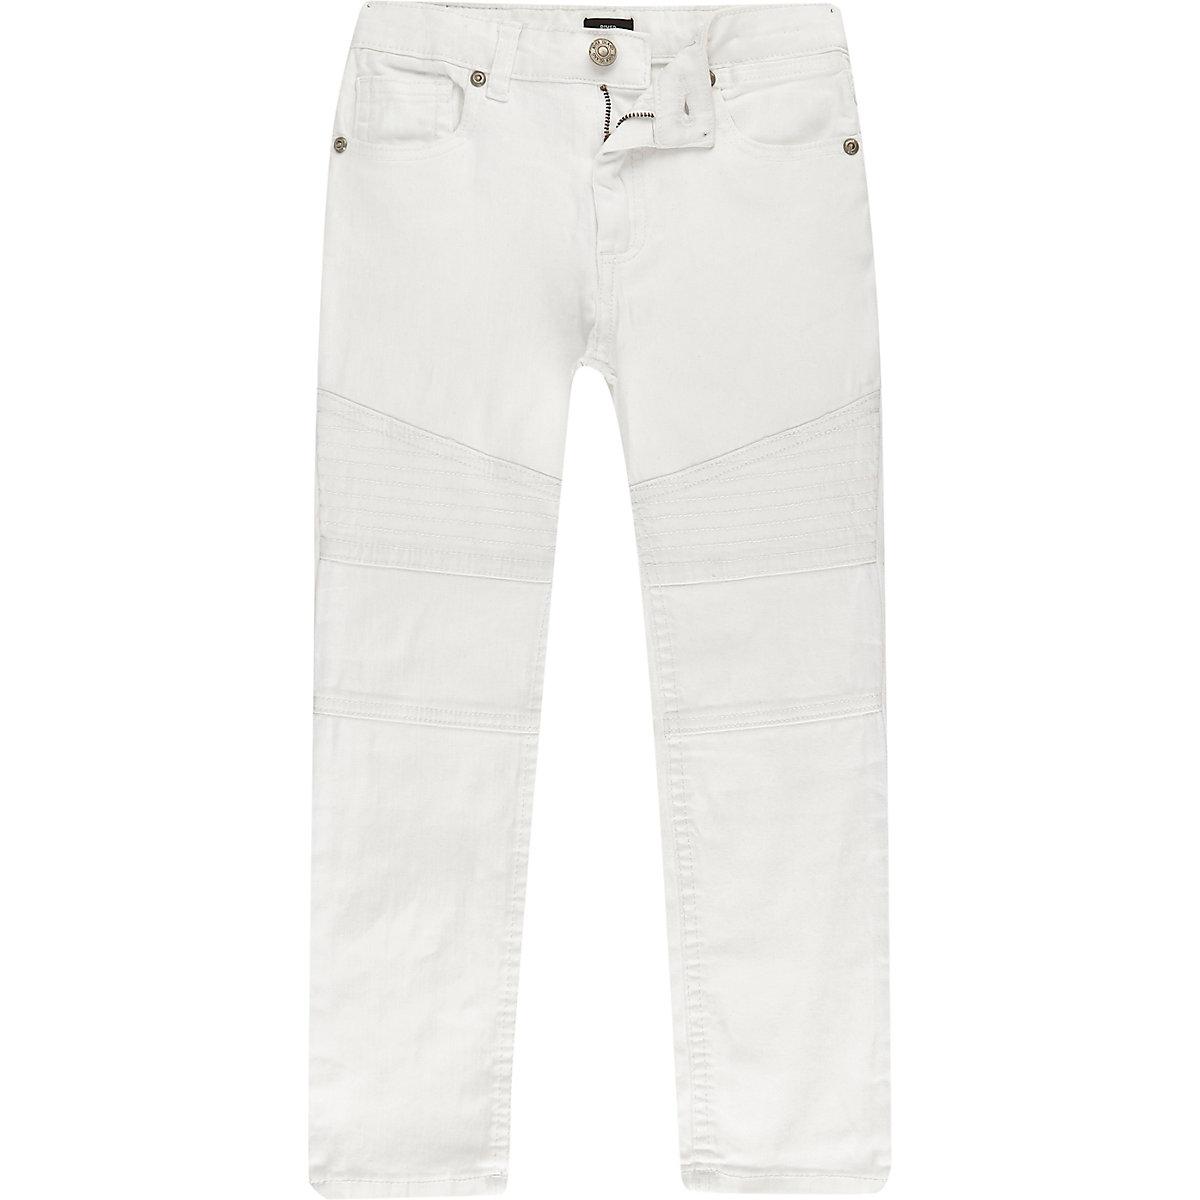 Sid – Jean skinny blanc style motard pour garçon